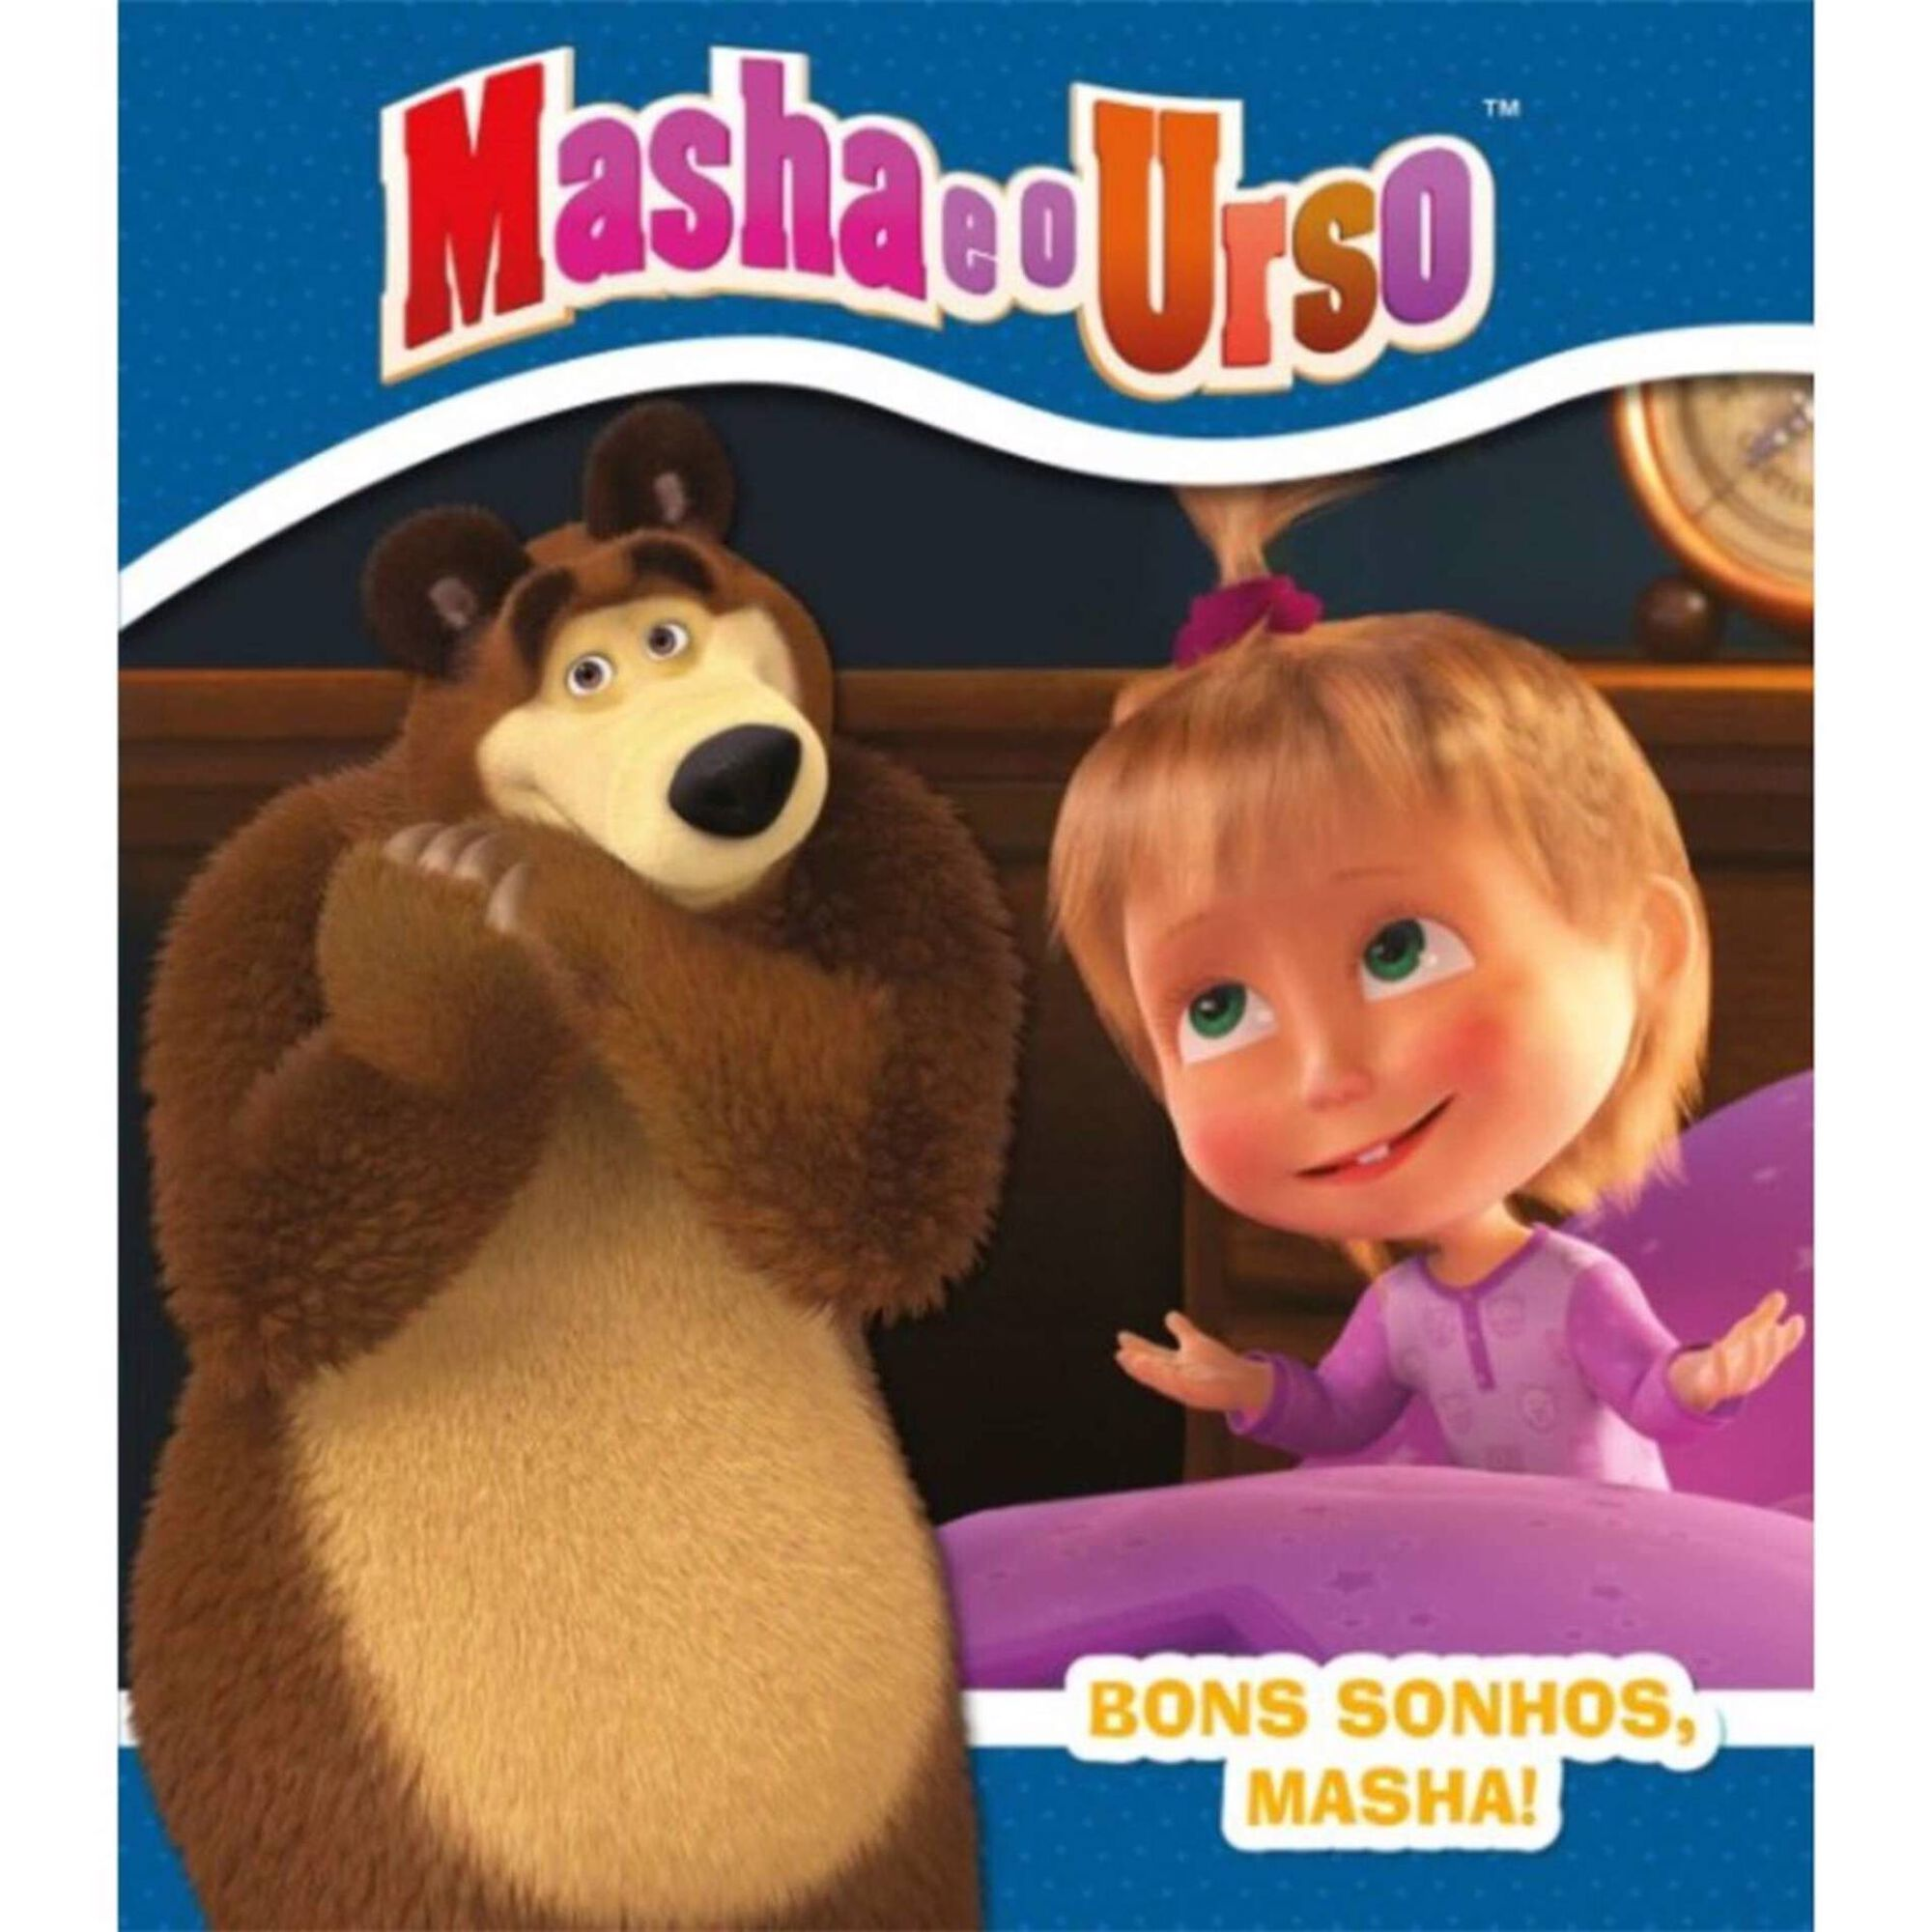 Masha e o Urso - Bons Sonhos, Masha!